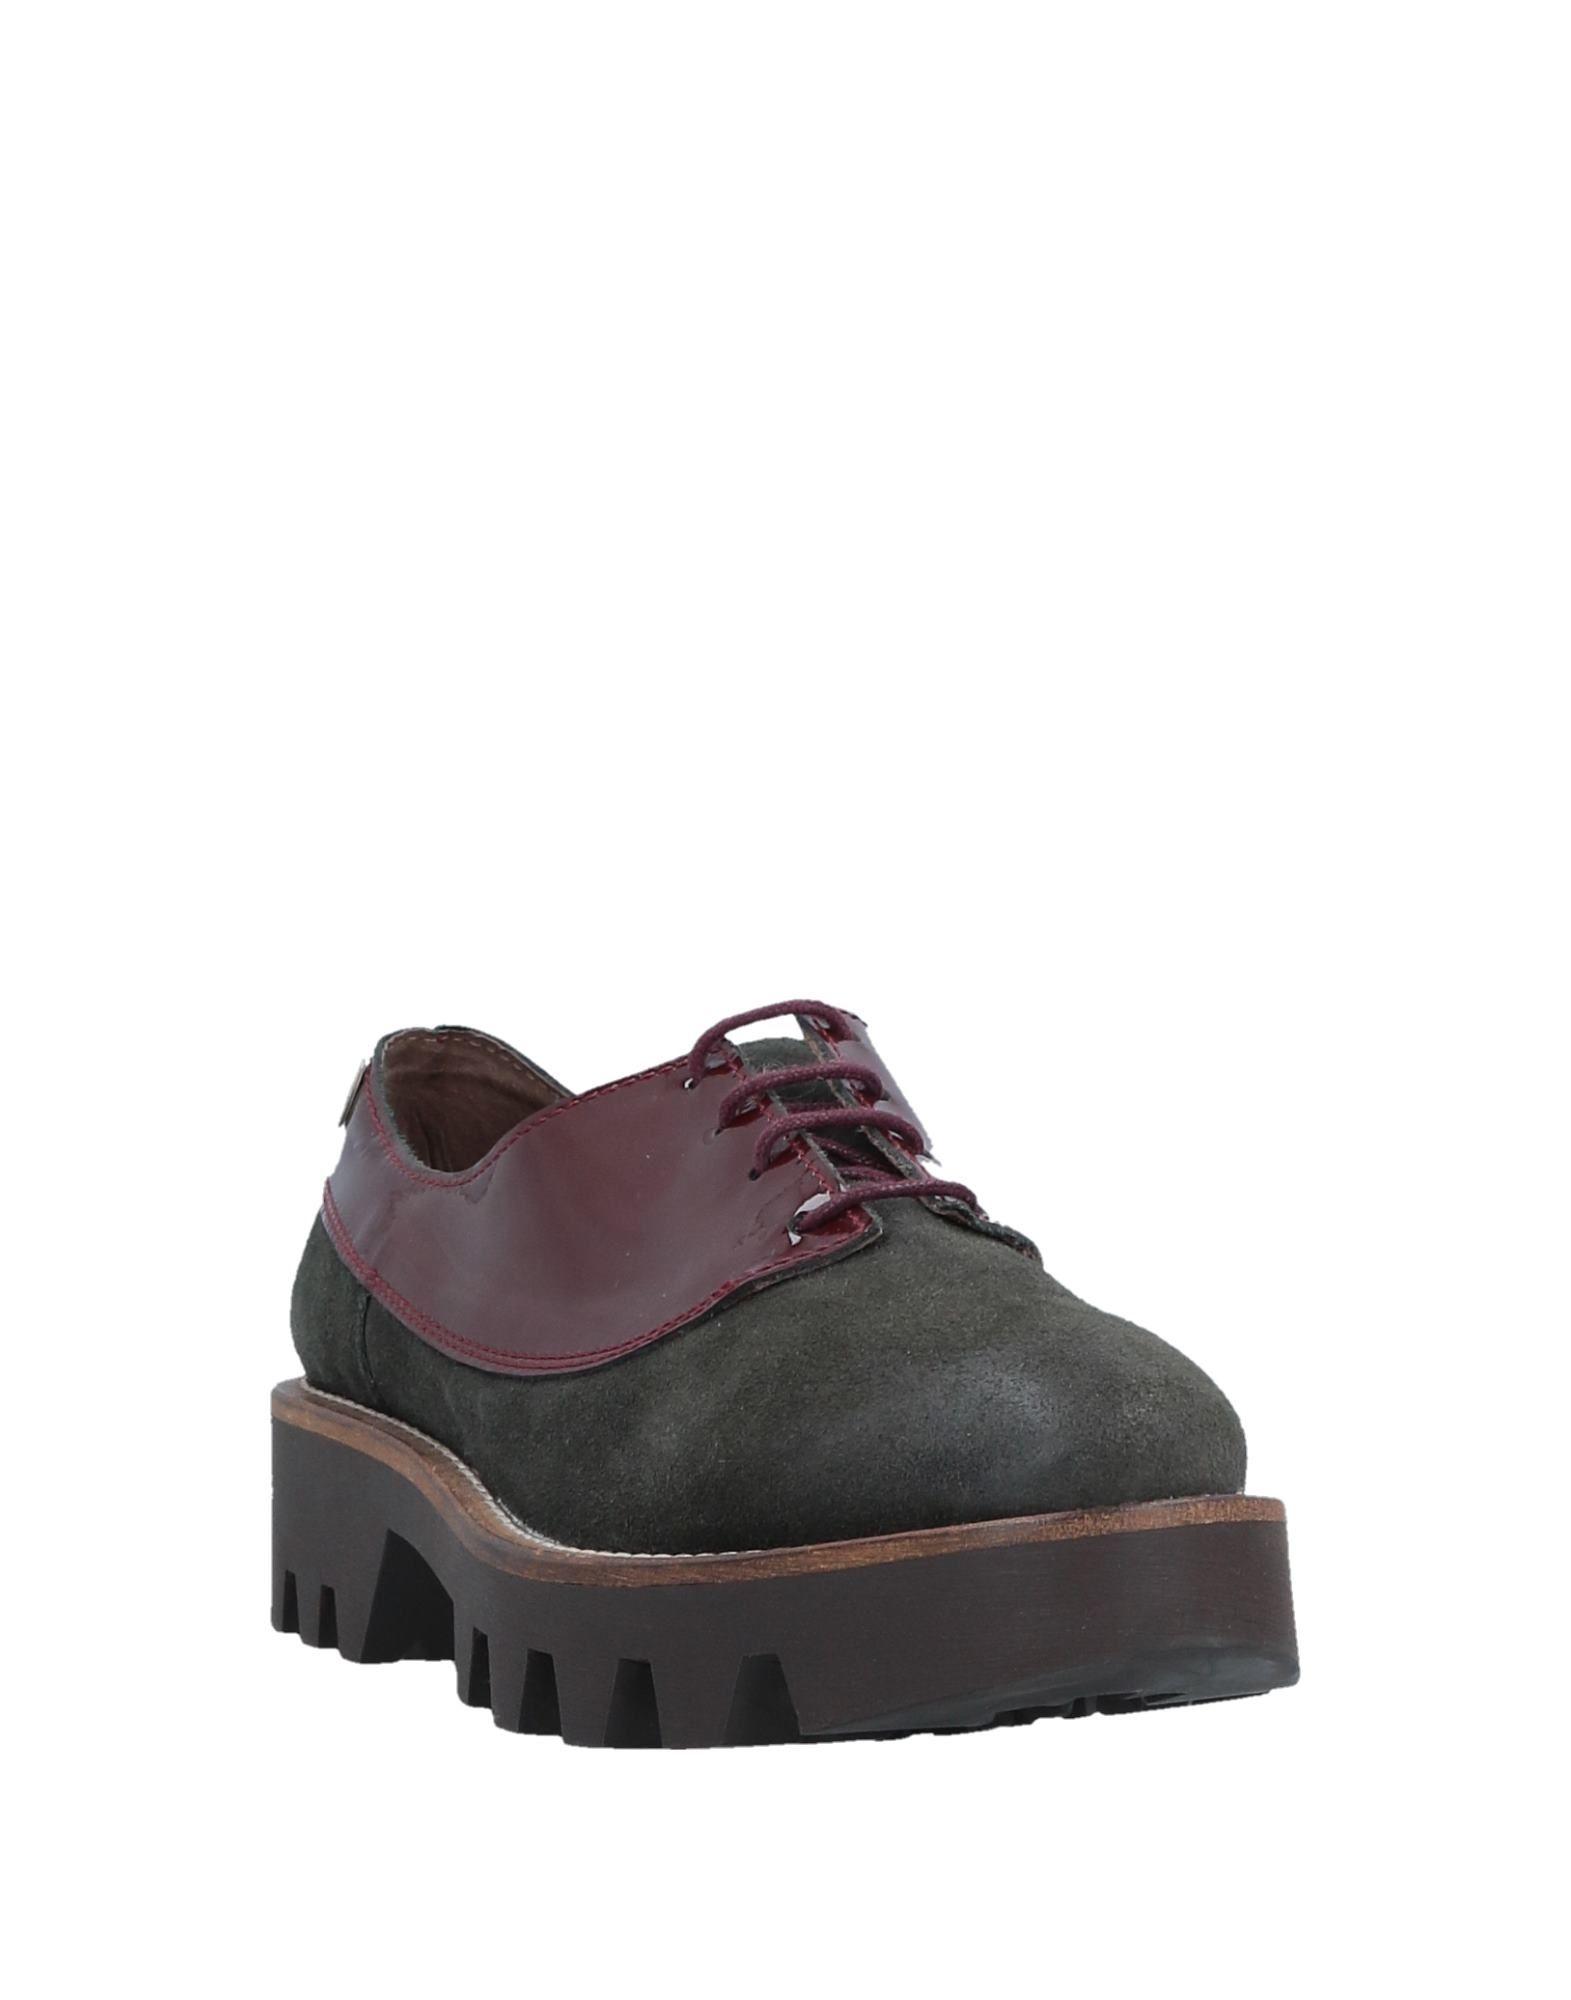 Manila Grace Schnürschuhe Damen  Neue 11521413JG Neue  Schuhe f11d58